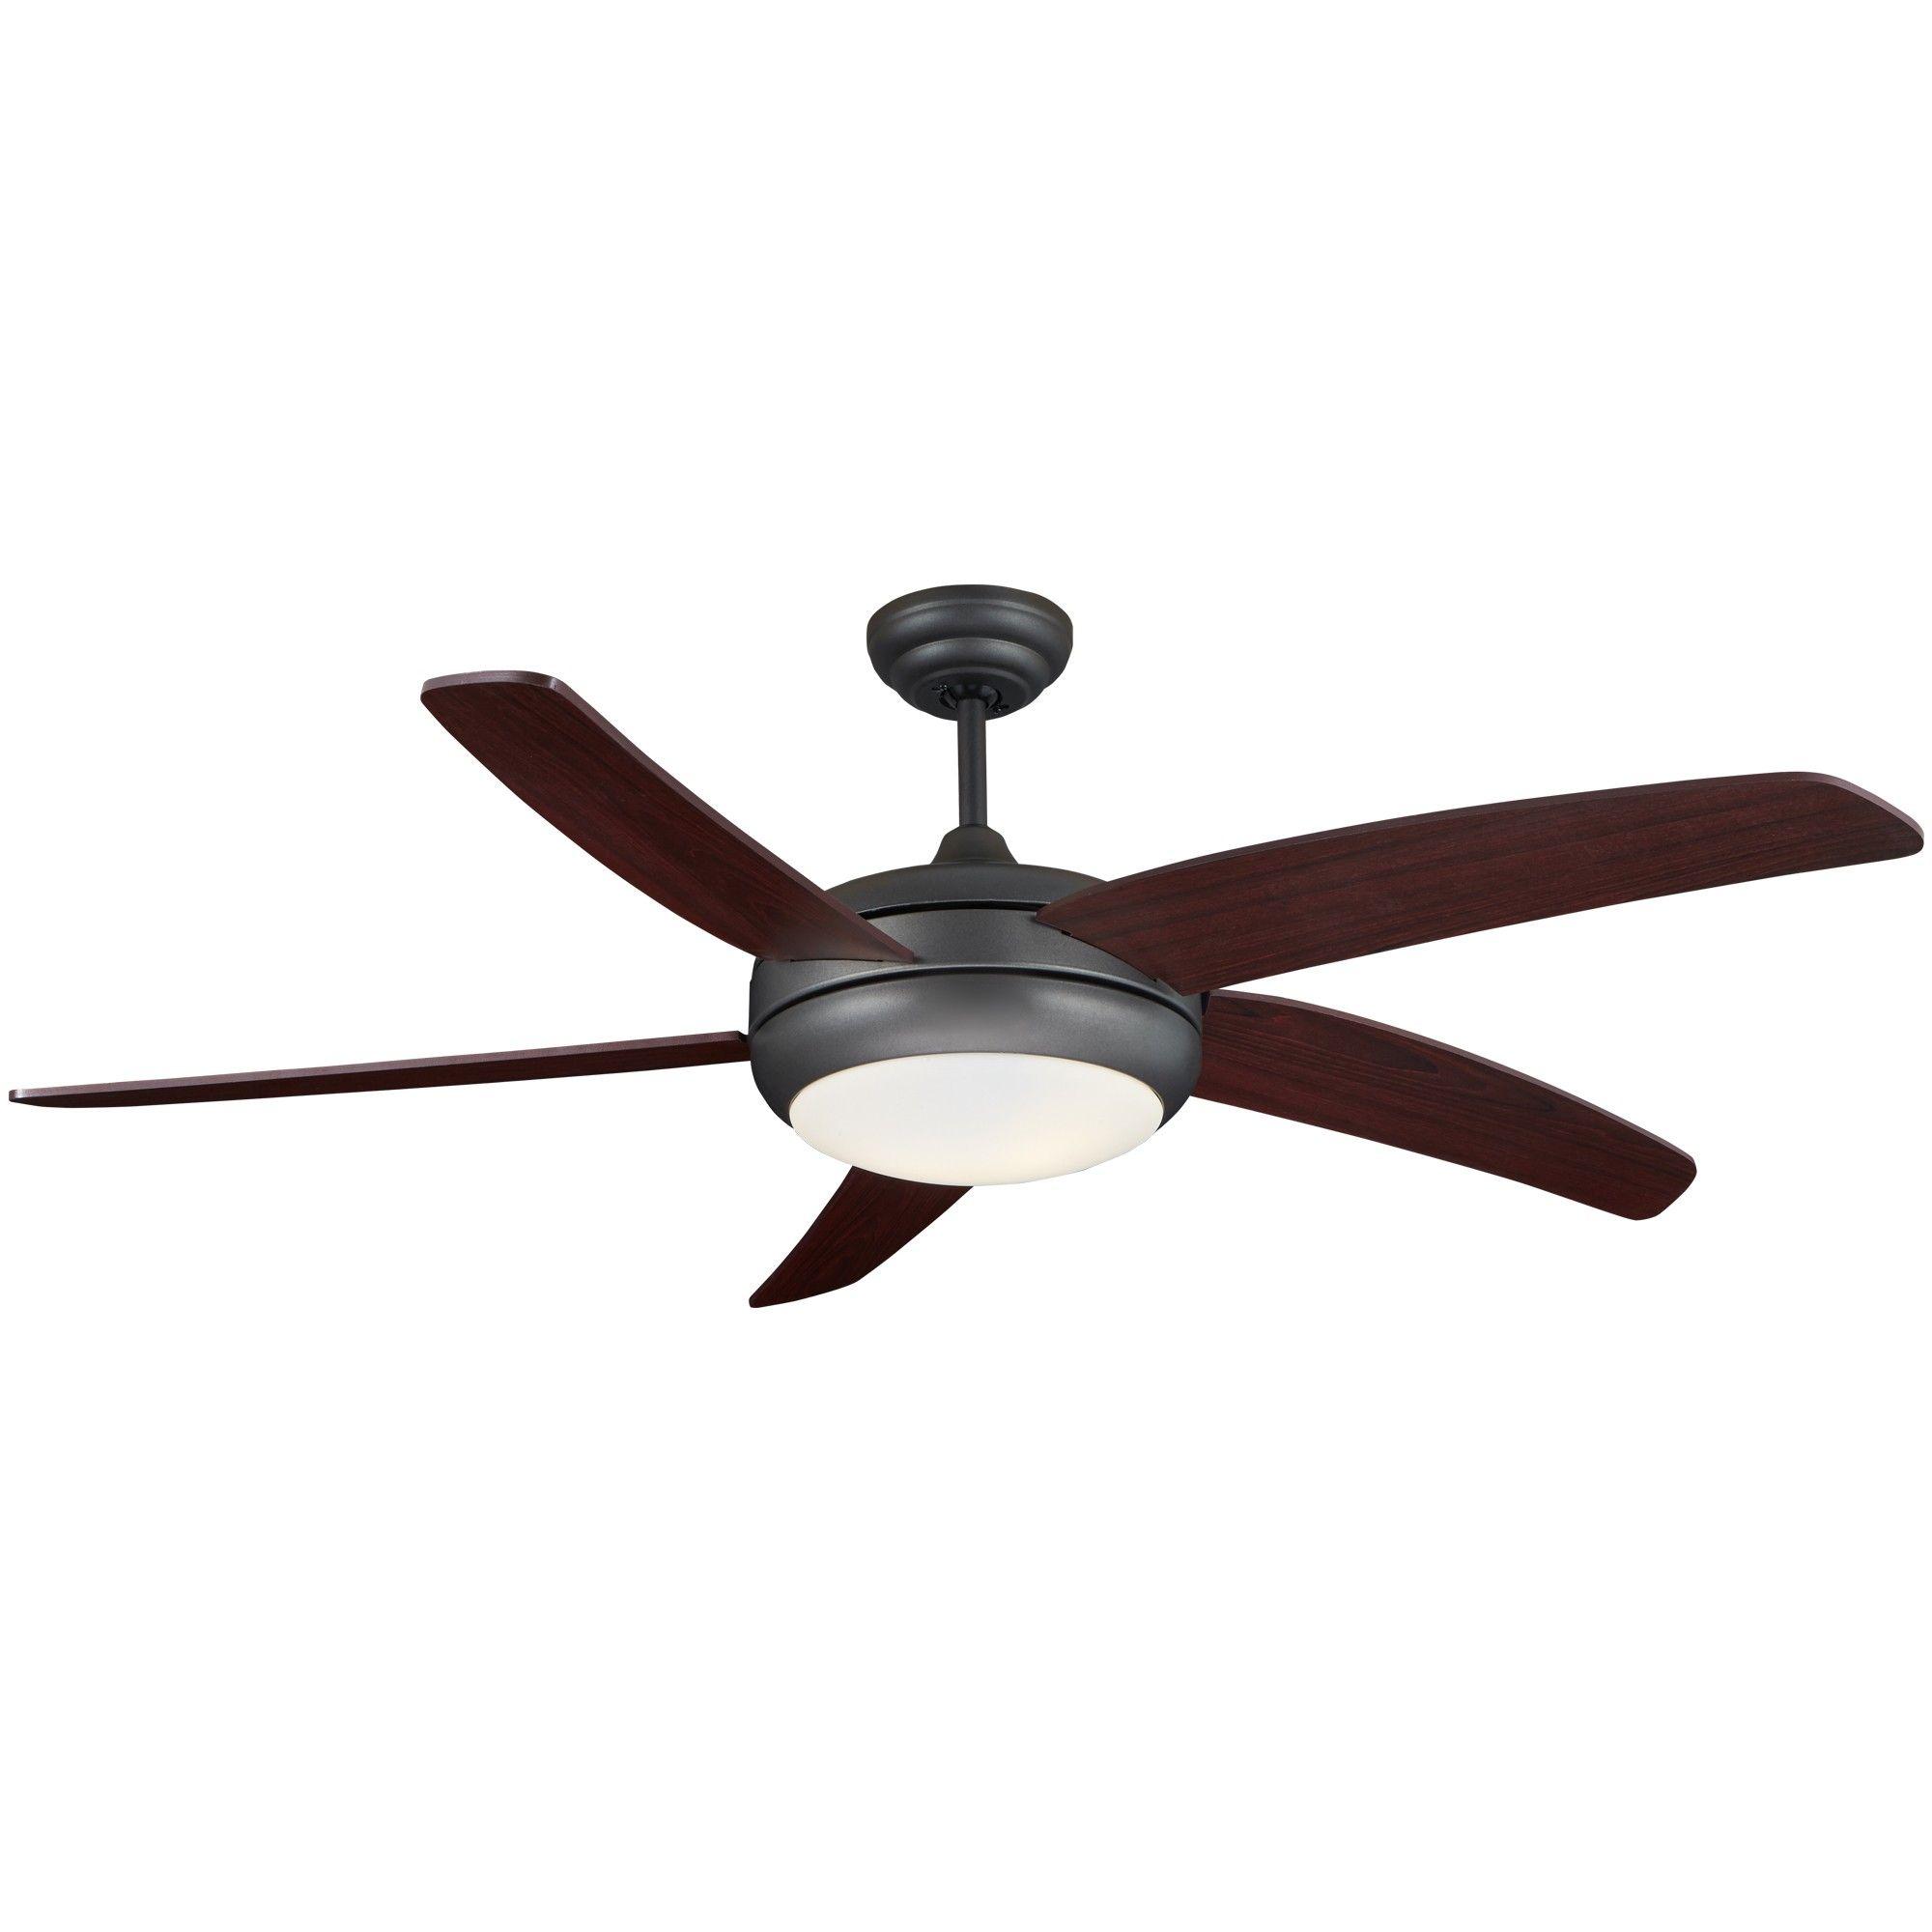 "Frisco 52"" AC motor Ceiling Fan with Light Matte Black"